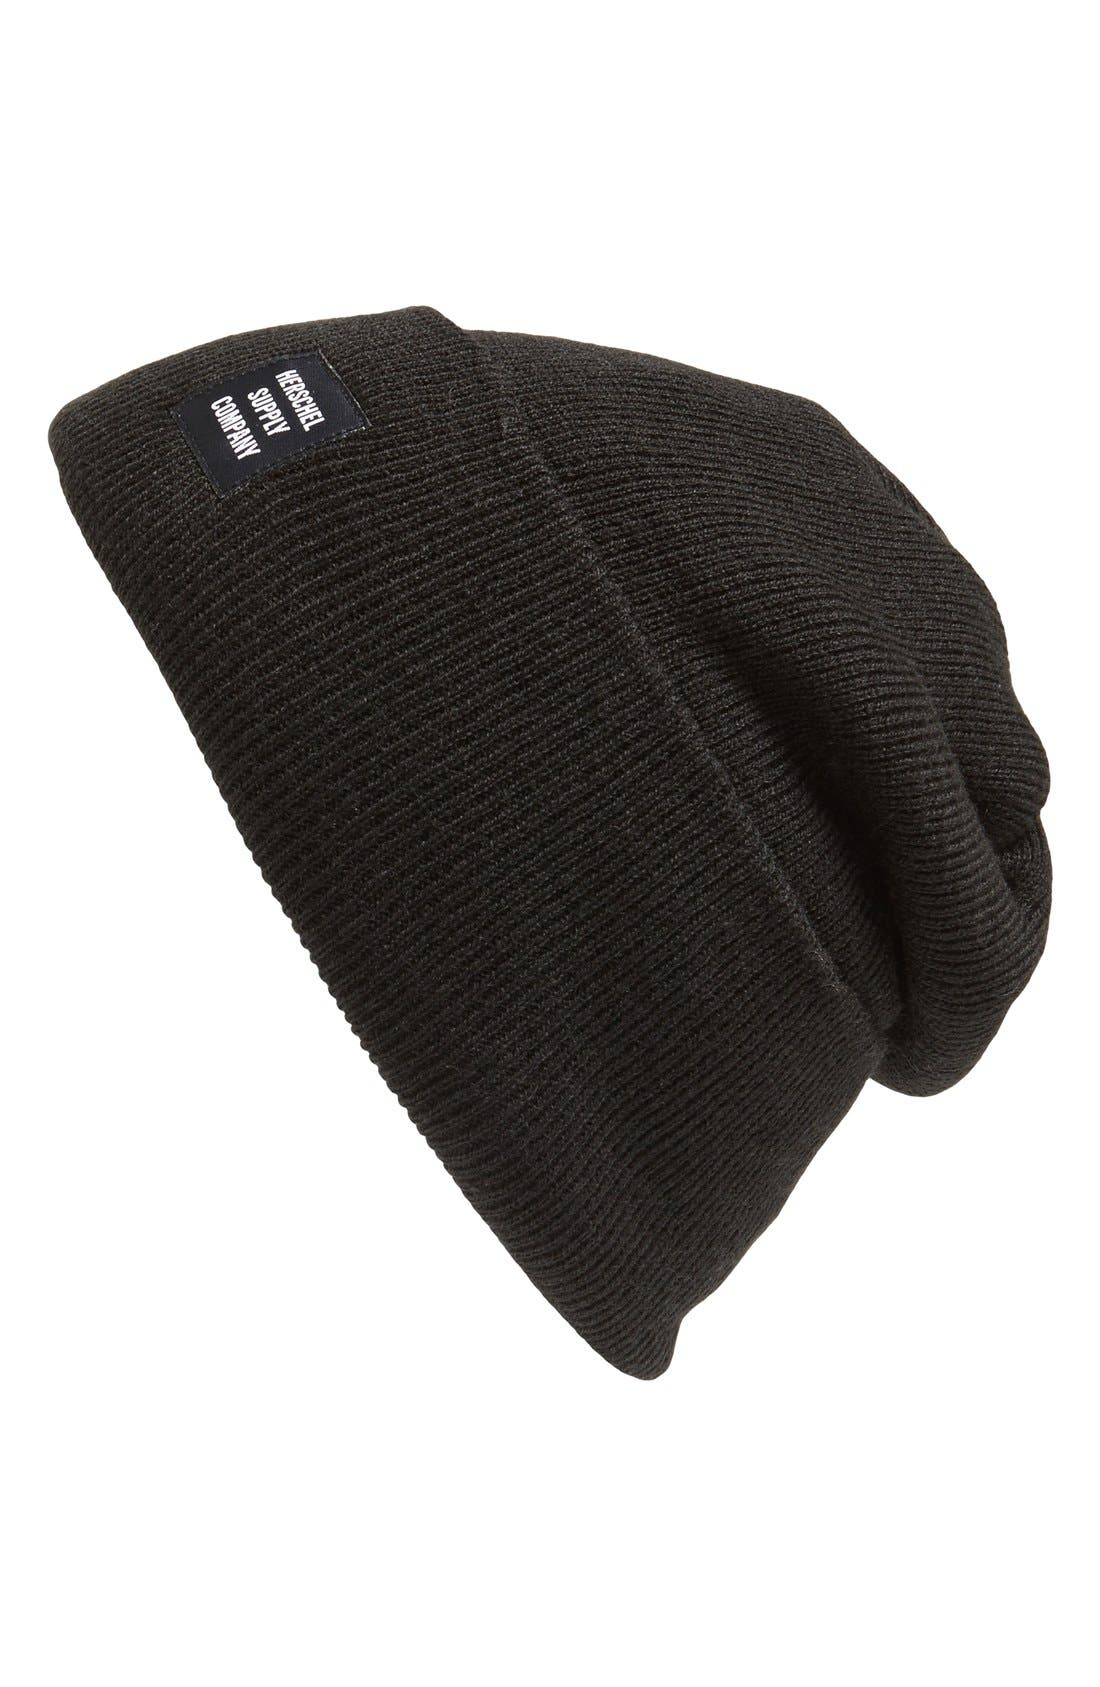 'Abbott' Knit Cap,                         Main,                         color, Black